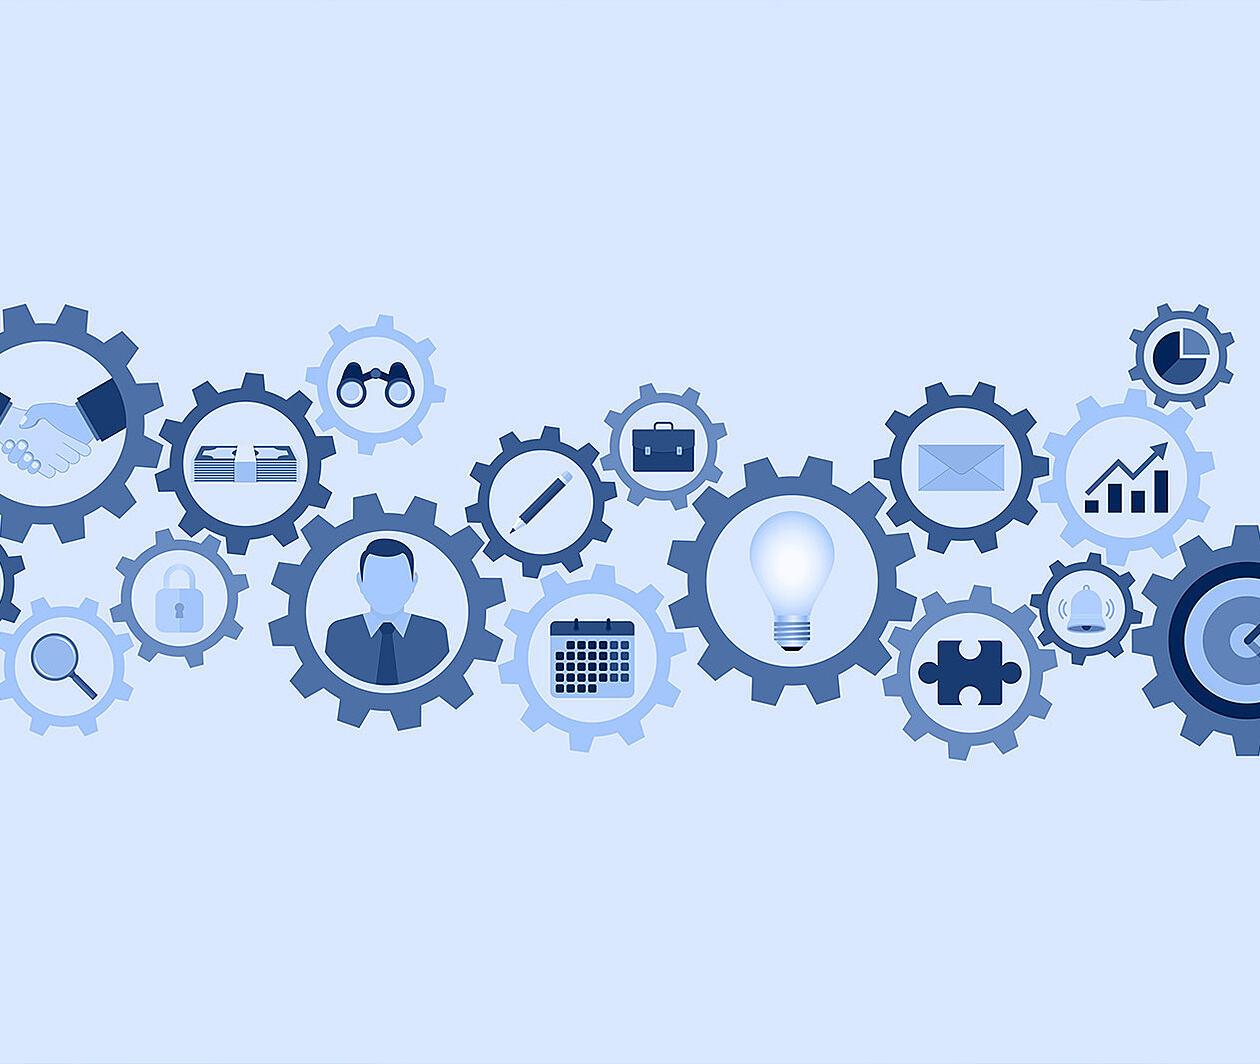 Project Management: Agile Manifesto Principles